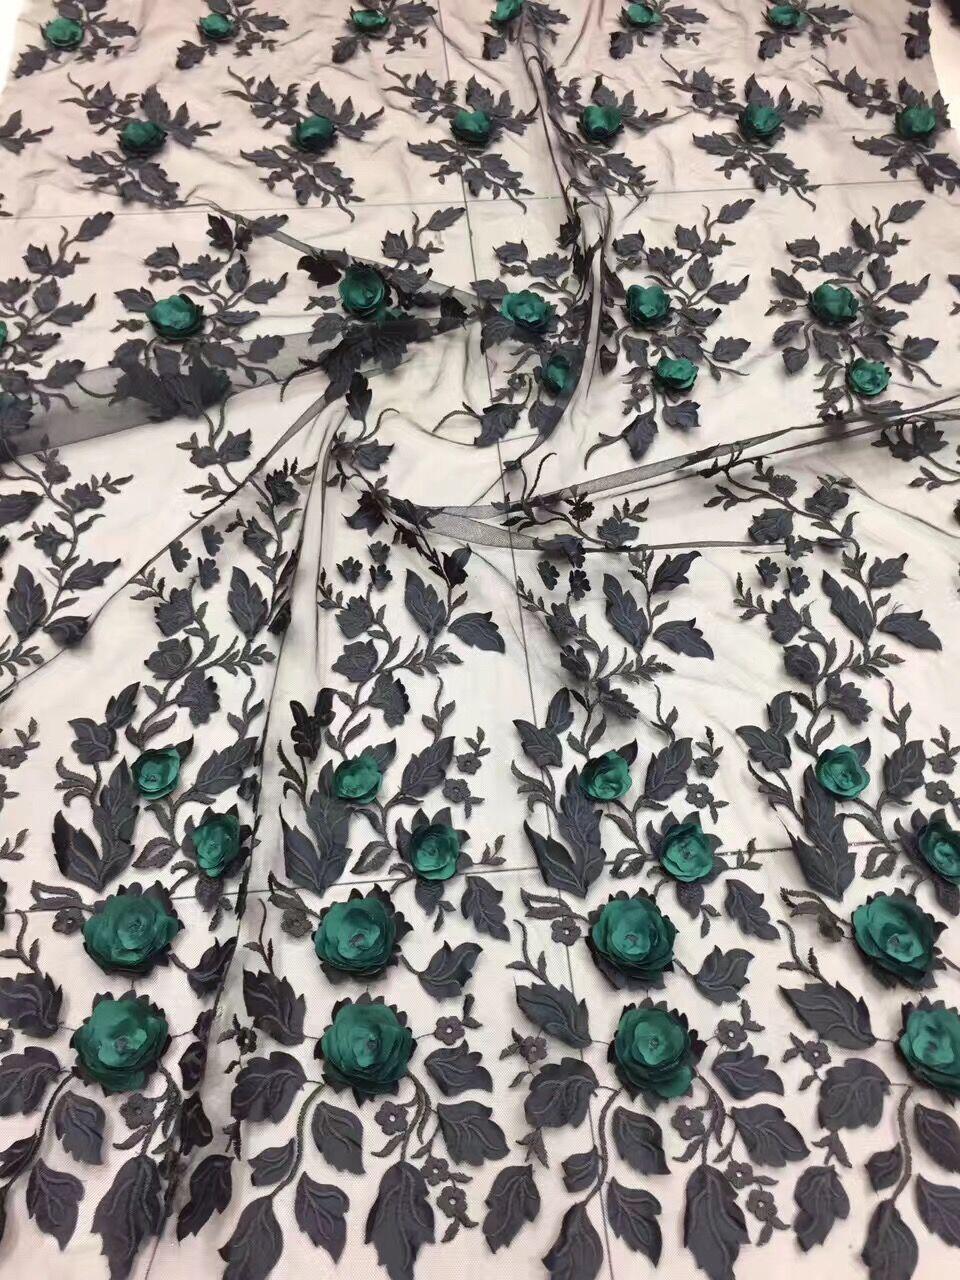 Joli LJY 61204 nigérian dentelle tissu livraison gratuite par dhl 3d fleur brodé tulle dentelle tissu pour belle robe-in Dentelle from Maison & Animalerie    1